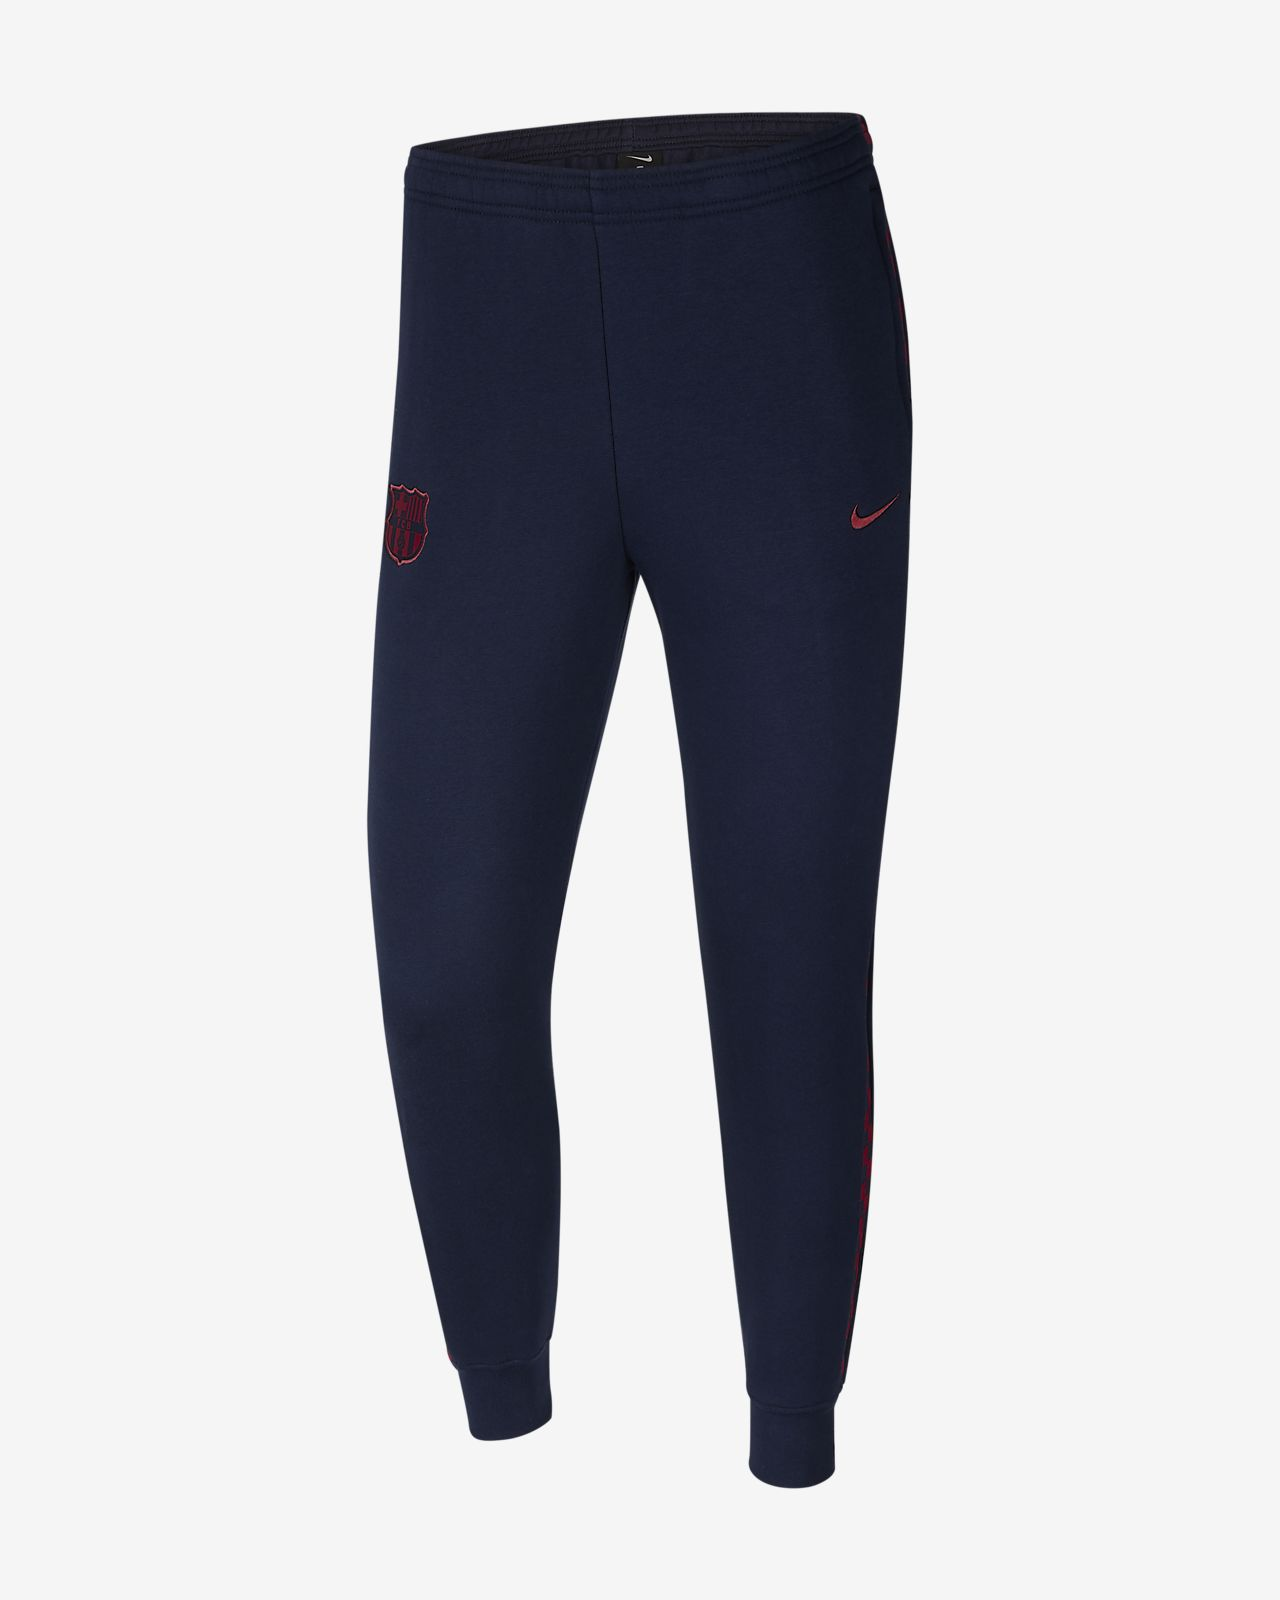 Pour En HommeFr Fleece Pantalon Barcelona Tissu Fc ULzVpGqSM